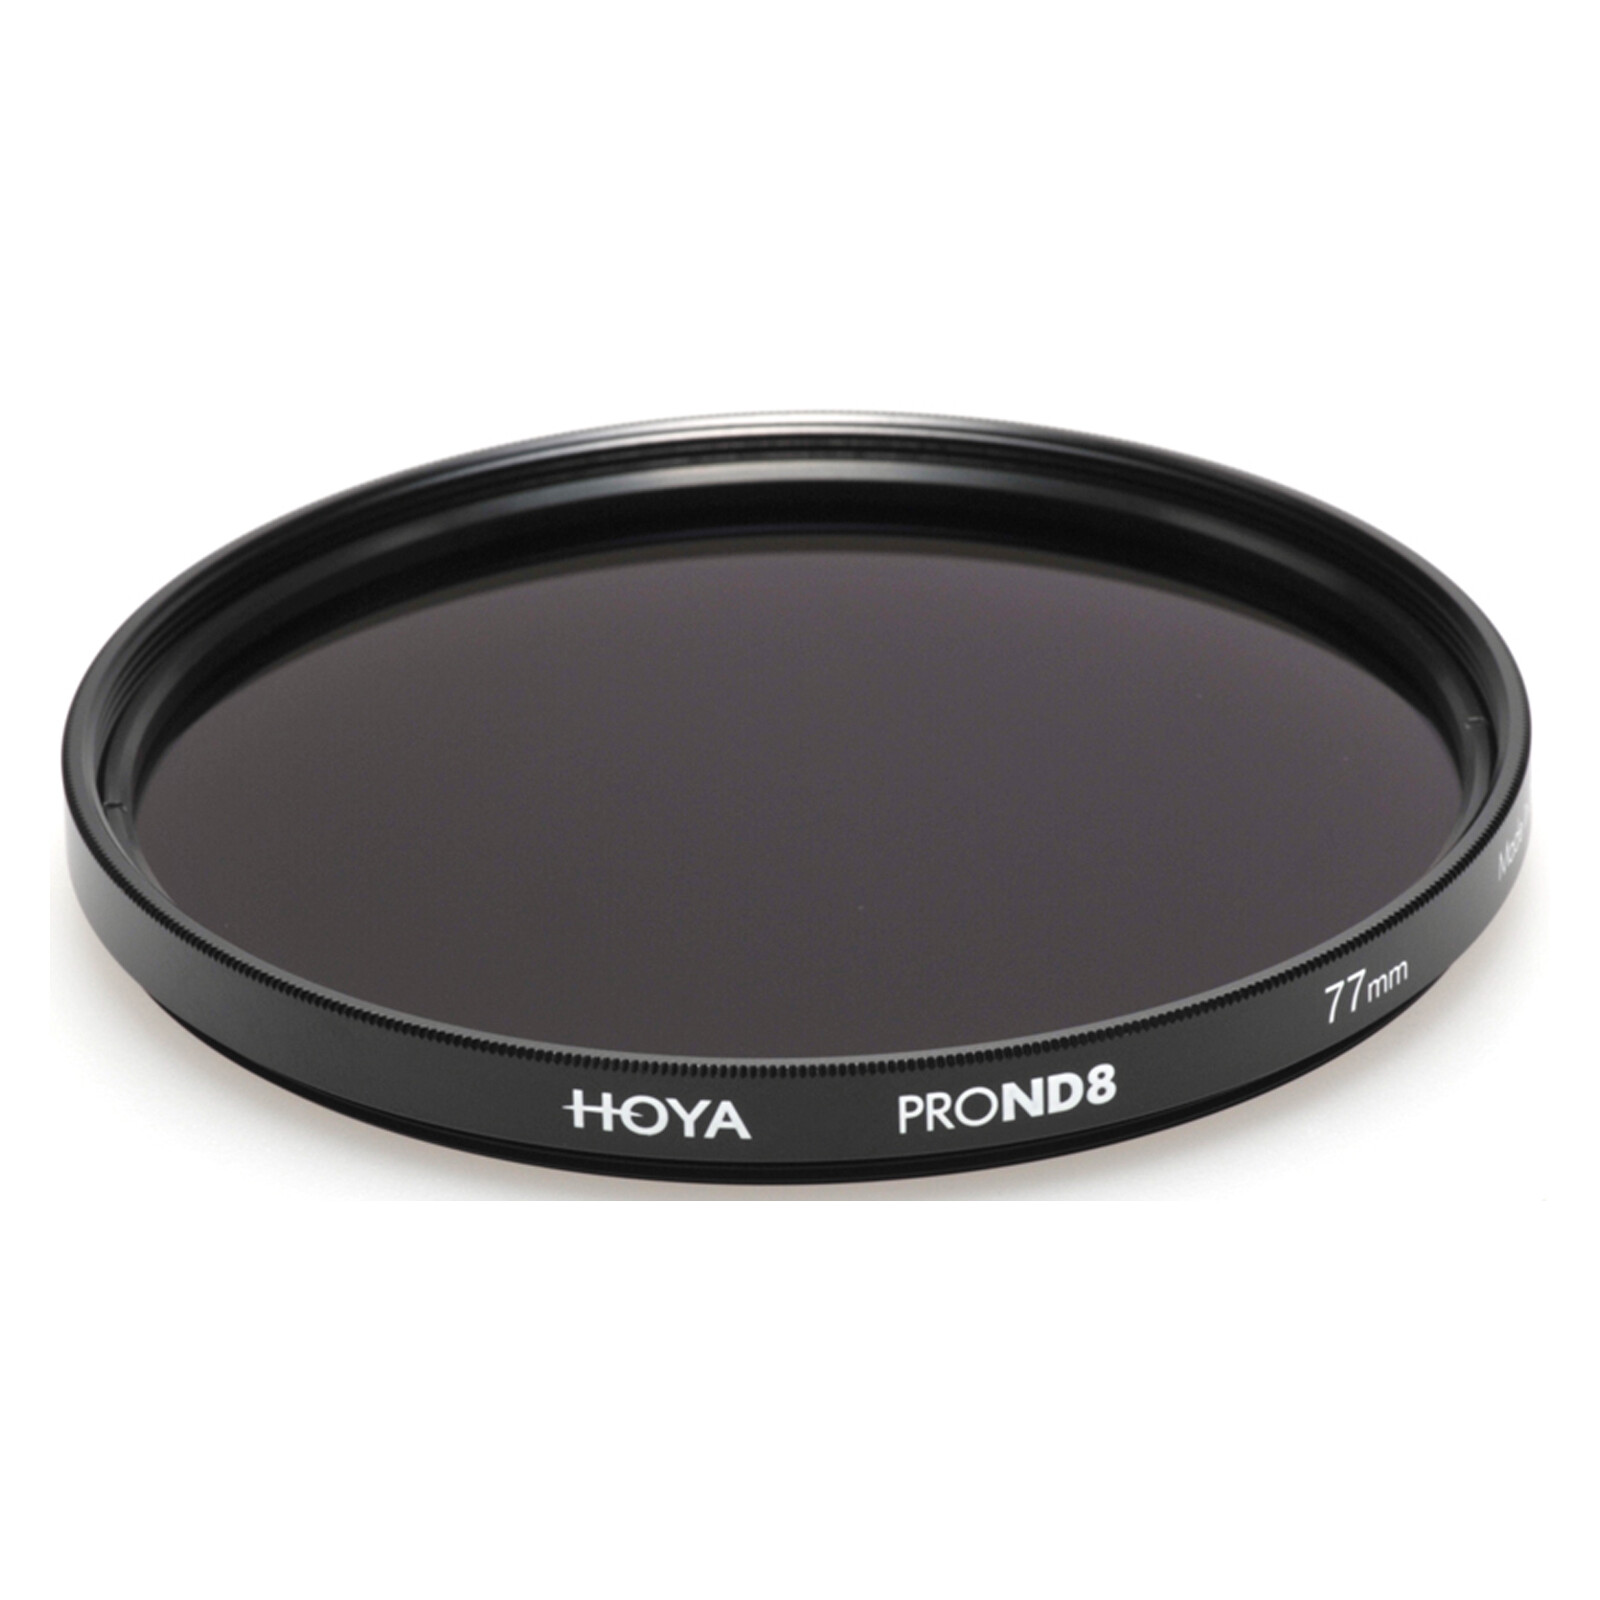 Hoya Grau PRO ND 8 49mm